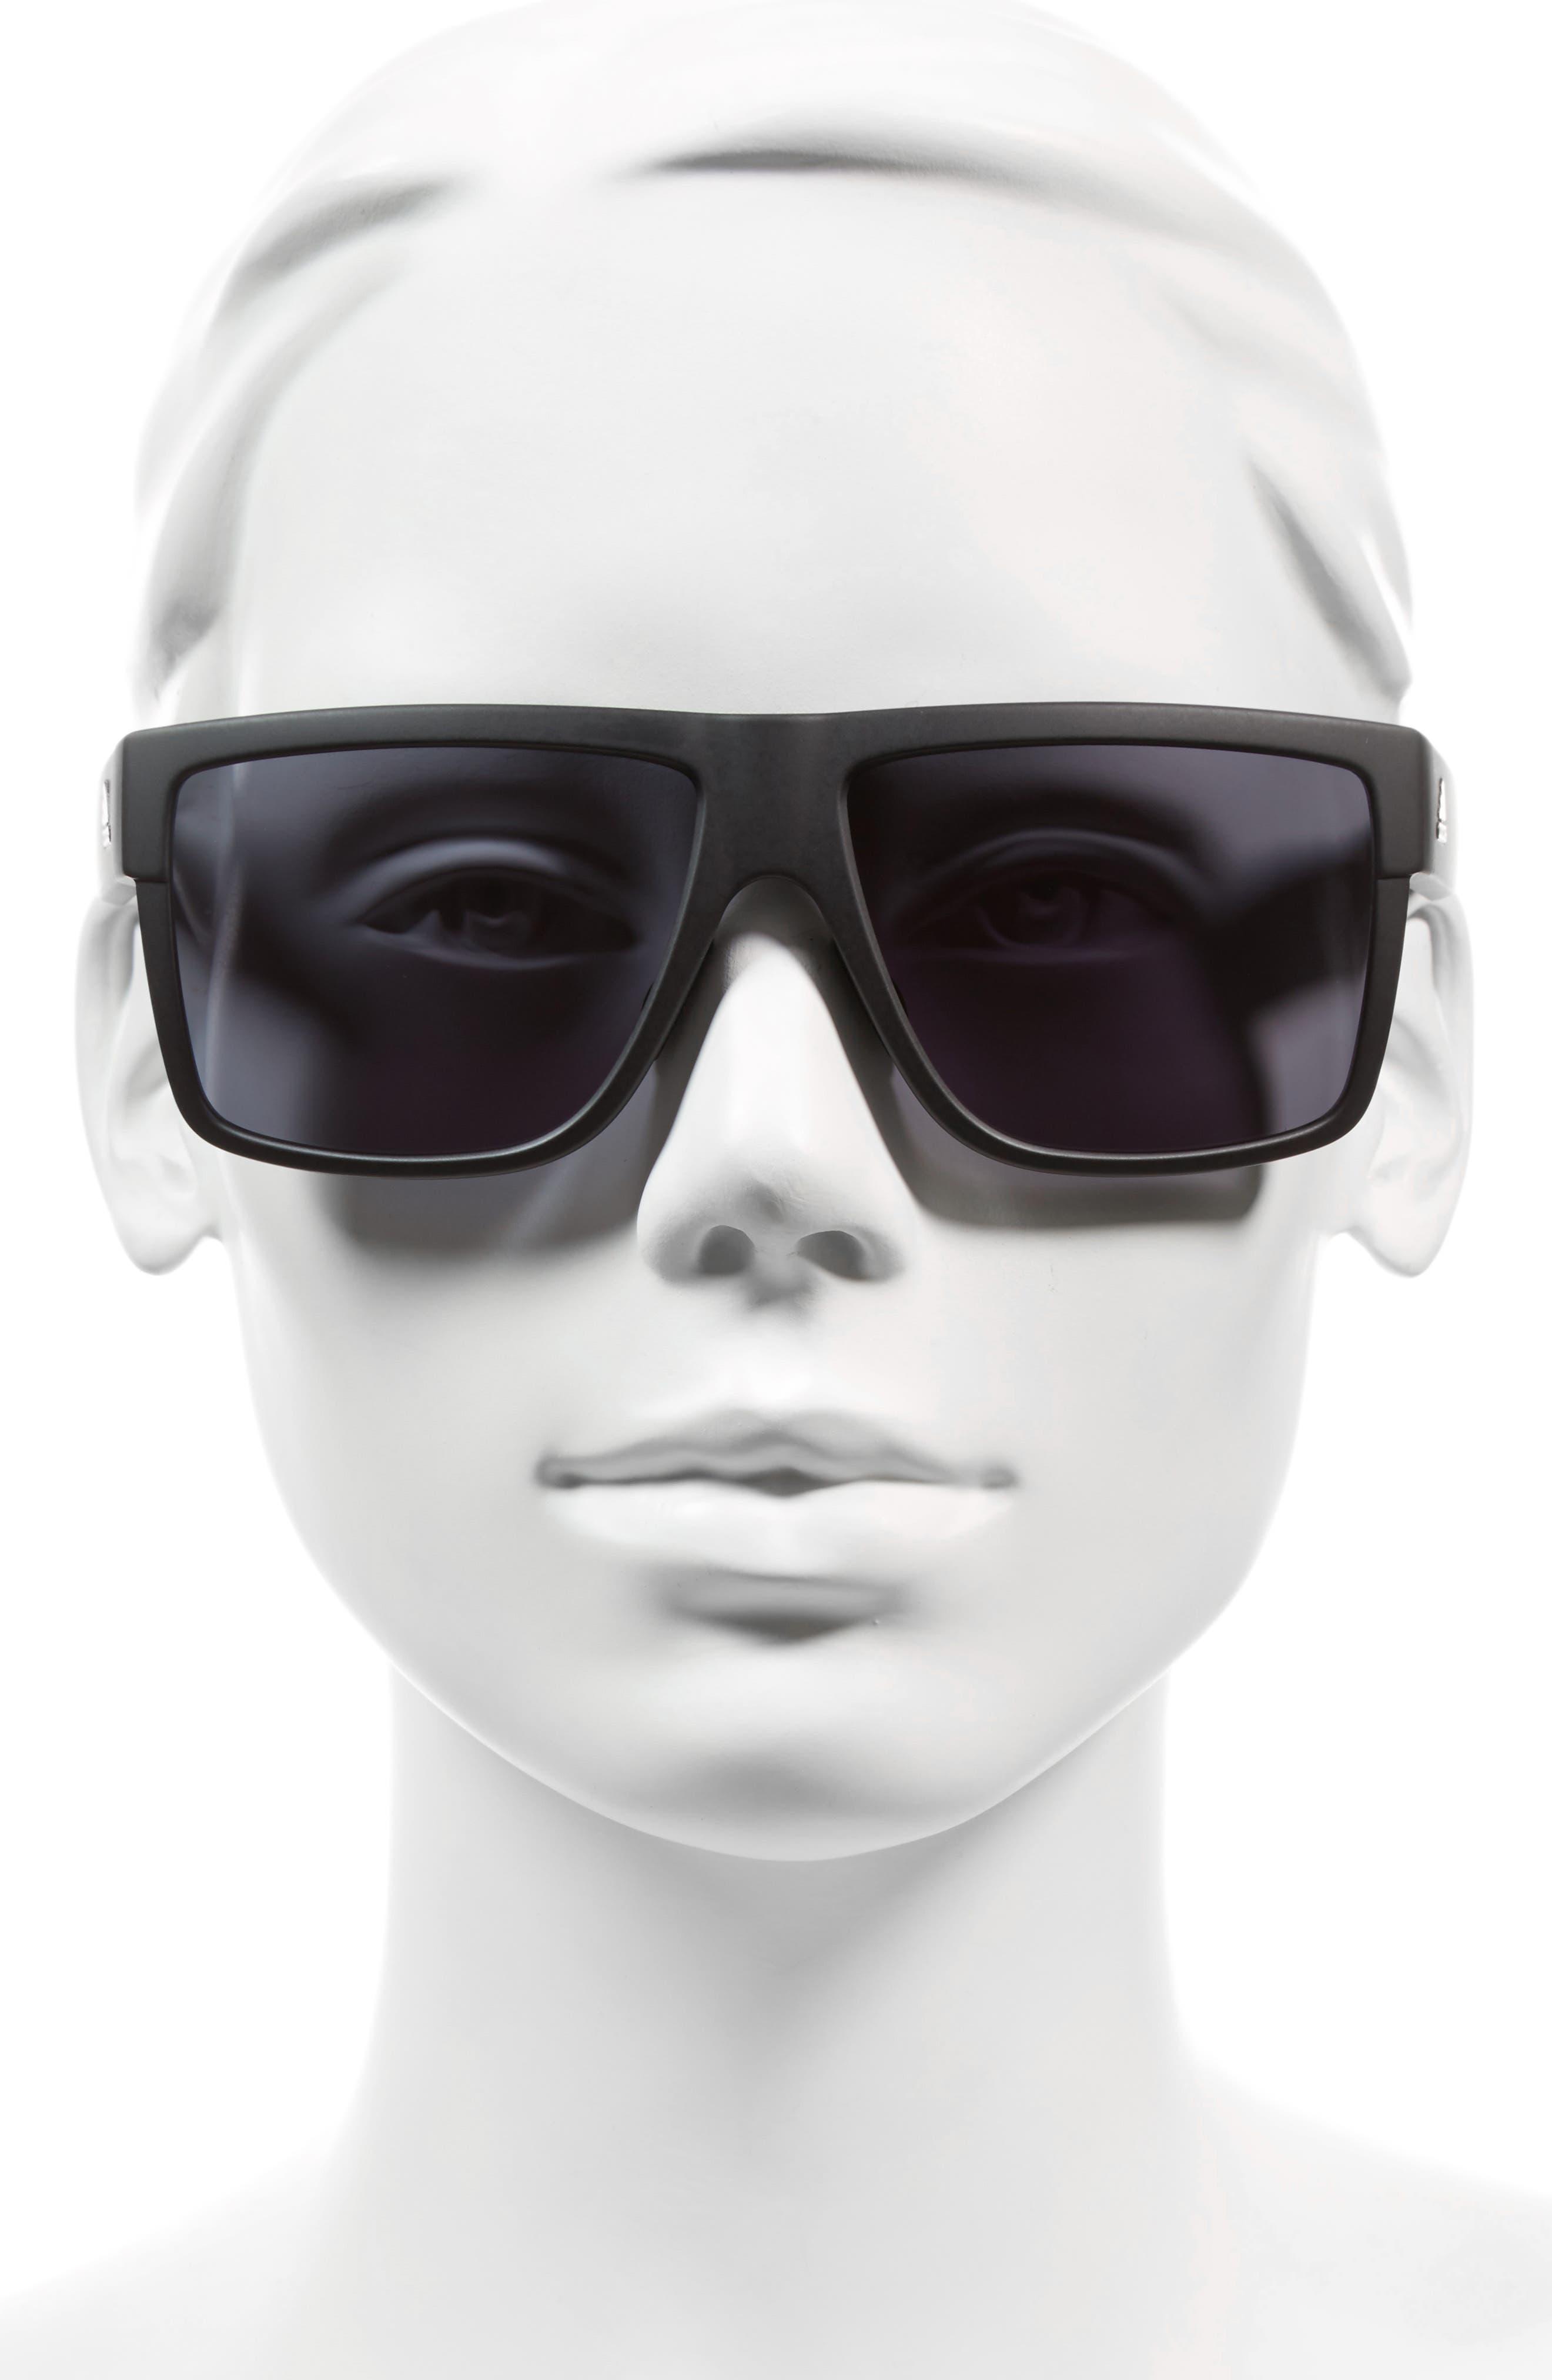 3Matic 60mm Sunglasses,                             Alternate thumbnail 2, color,                             Black Matte/ Grey